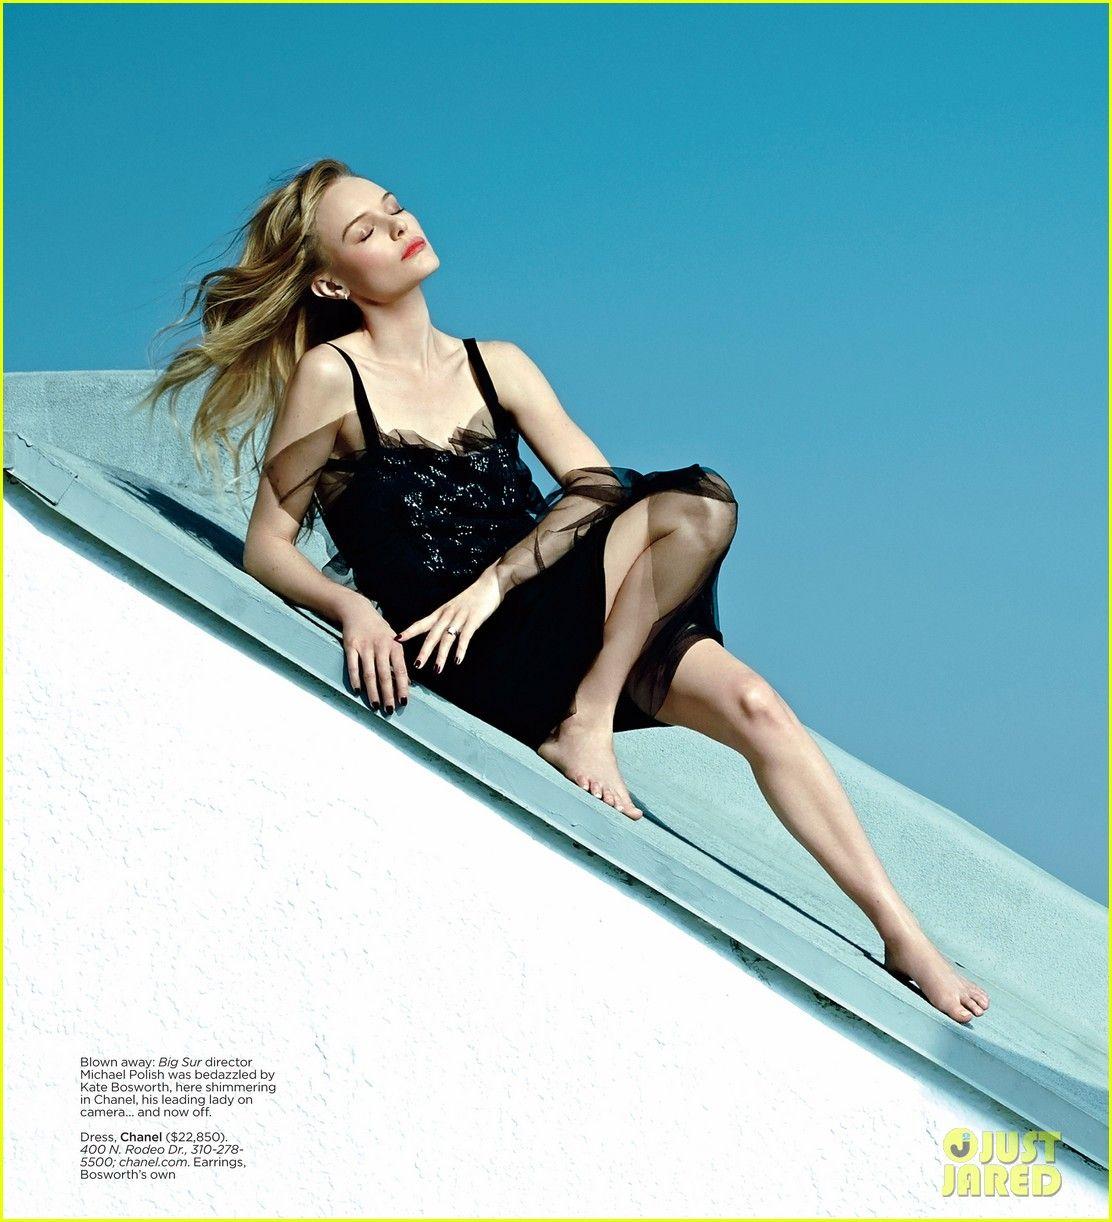 Alessandra ambrosio boob slip on a photo shoot in malibu - 2019 year